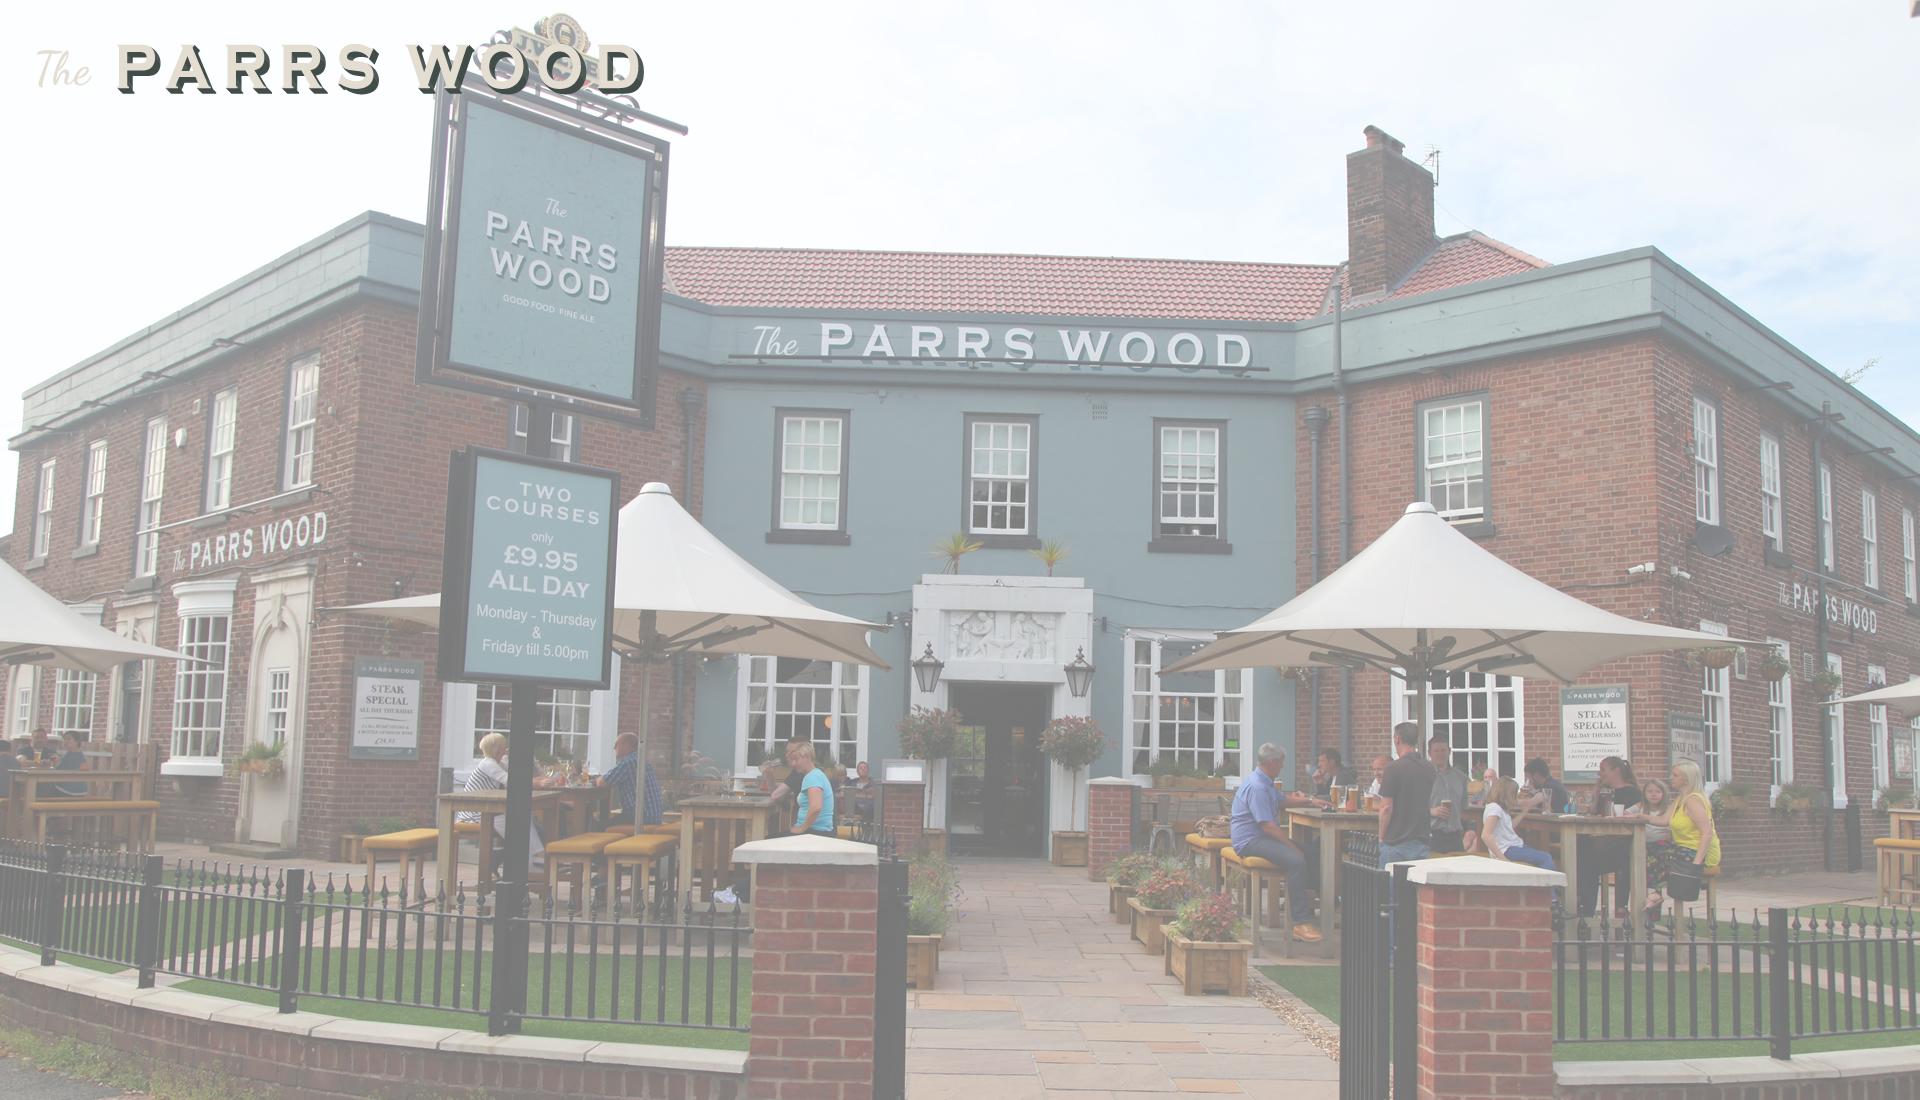 theparrswood-didsbury-manchester-pub-001